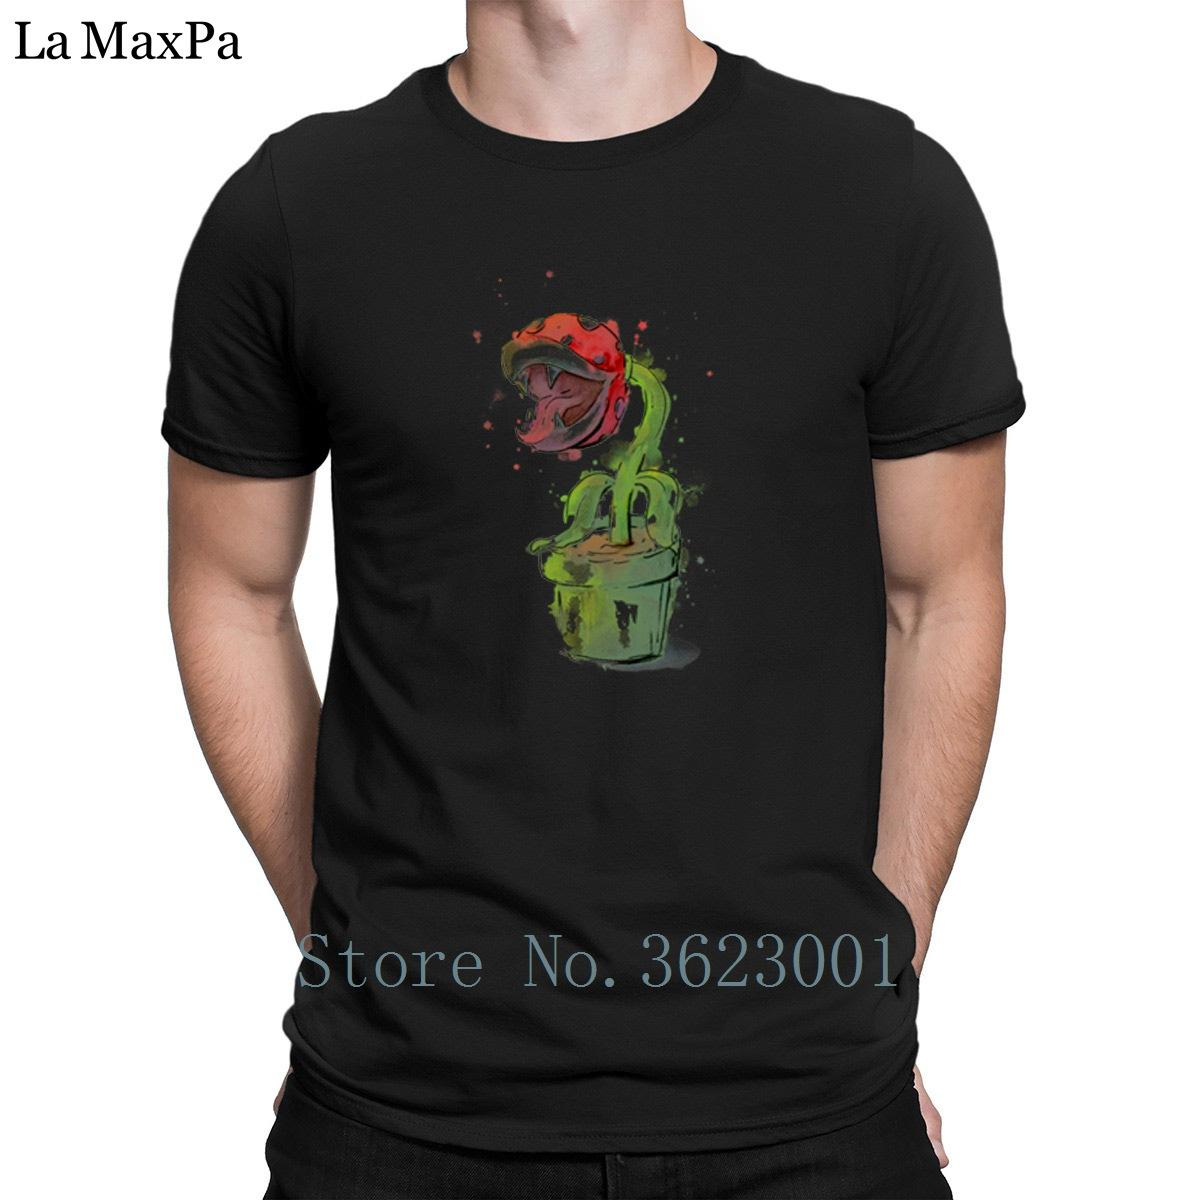 f30254667fdd4f Designing Family Tee Shirt Man Piranha Plant Watercolor Men Tee Shirt Slim  Fit Basic T Shirt Man O Neck T Shirt Cheap Clothes Design And Buy T Shirts  Tee ...